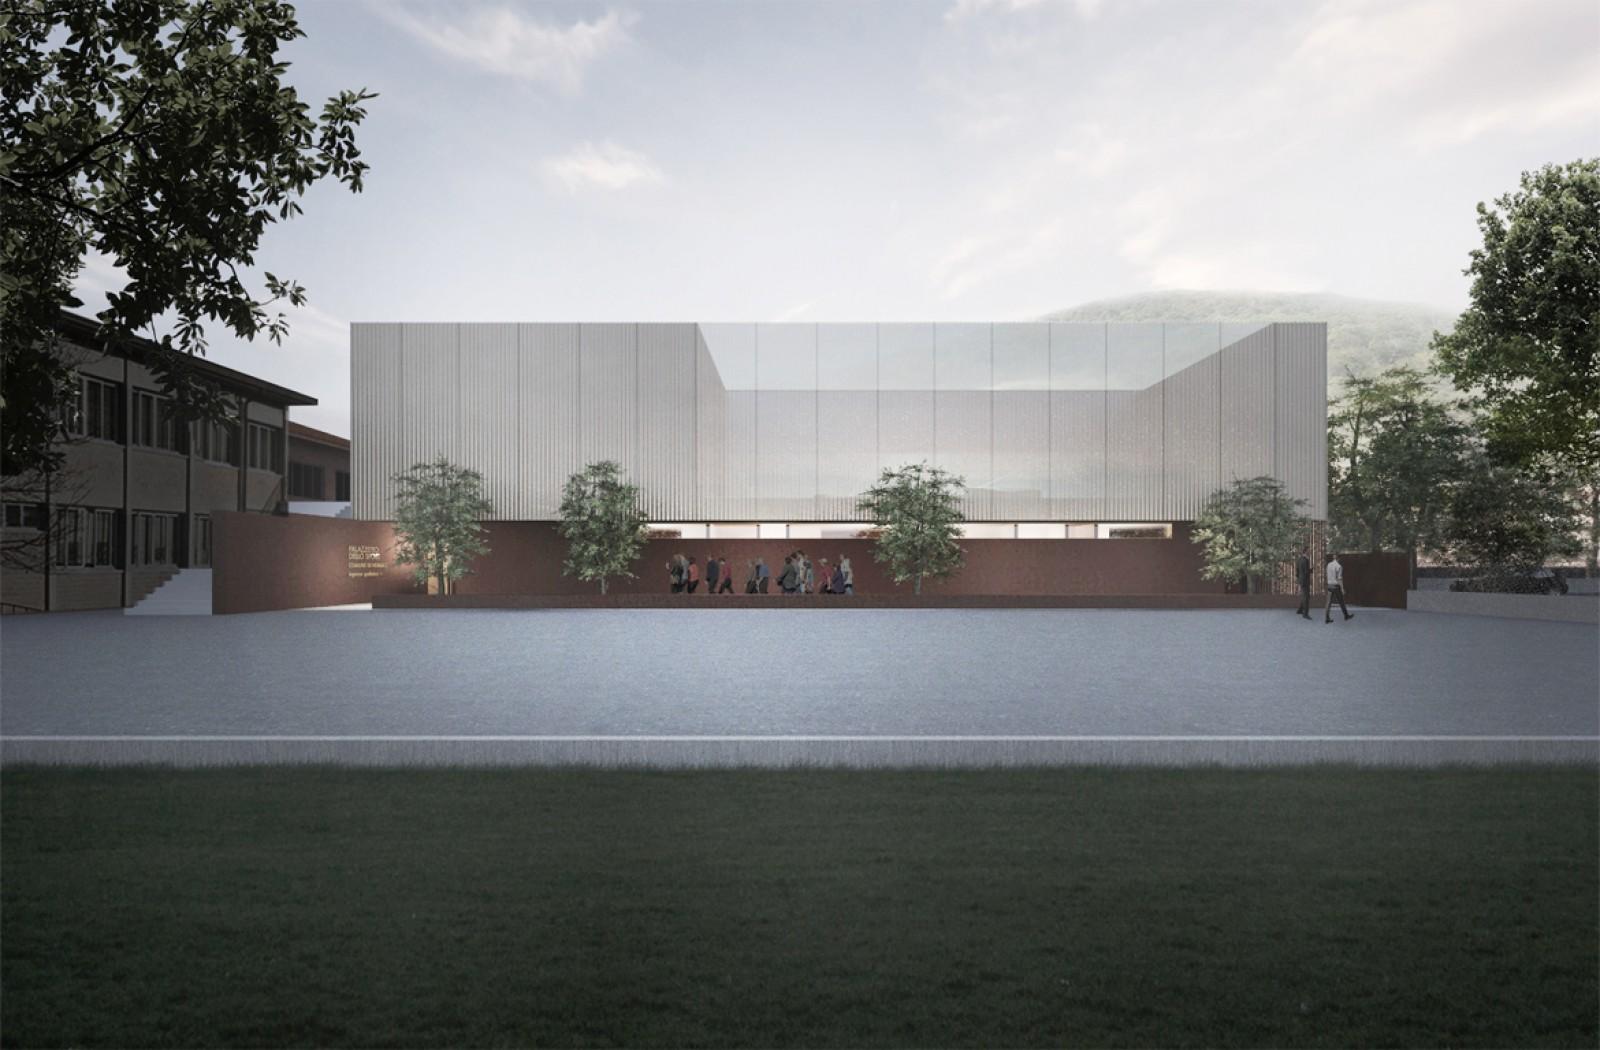 Nembro sports hall